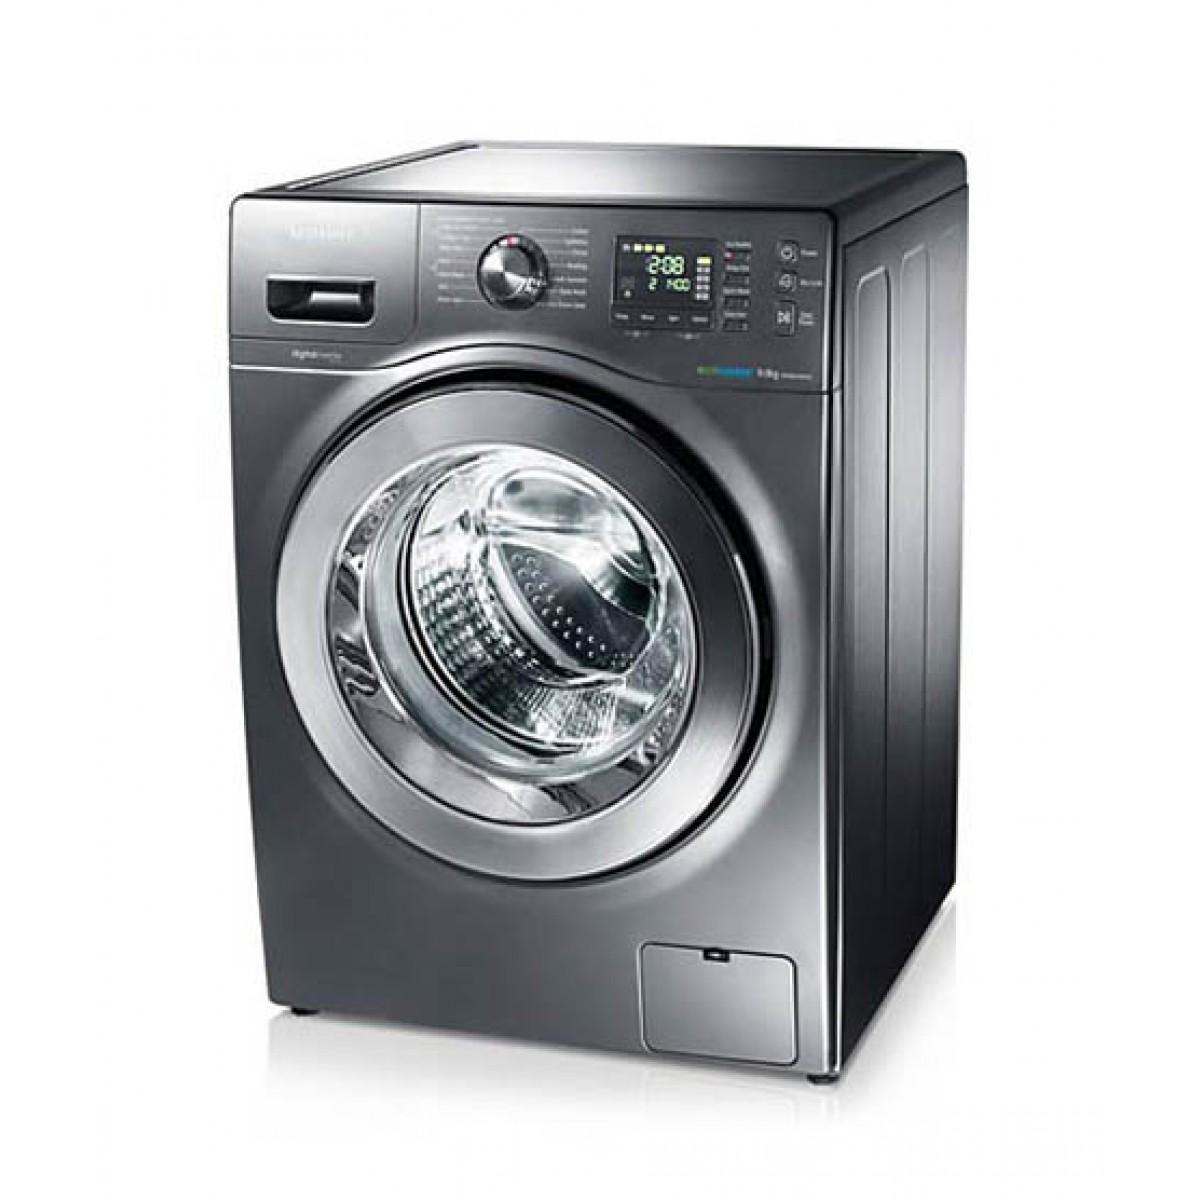 Samsung Fully Automatic Front Load Washing Machine (WF906U4SAGD)